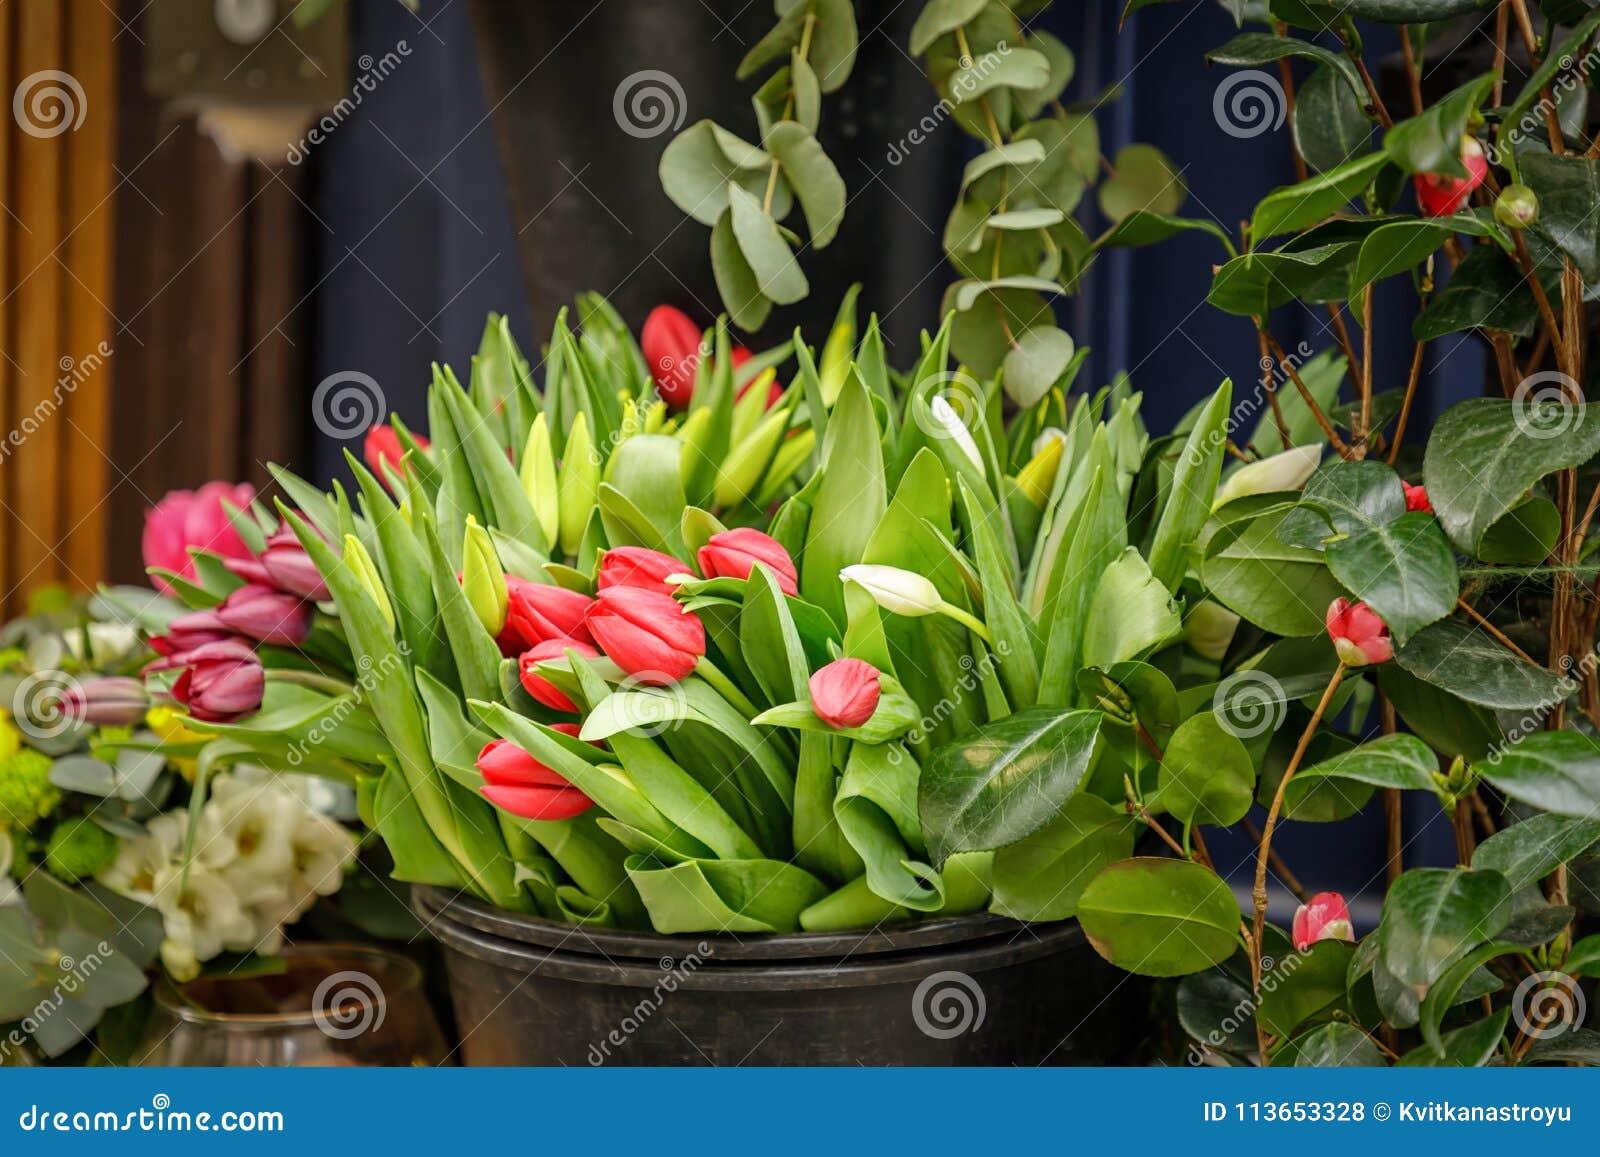 Flower shop in paris france spring flowers tulips stock photo flower shop in paris france spring flowers tulips mightylinksfo